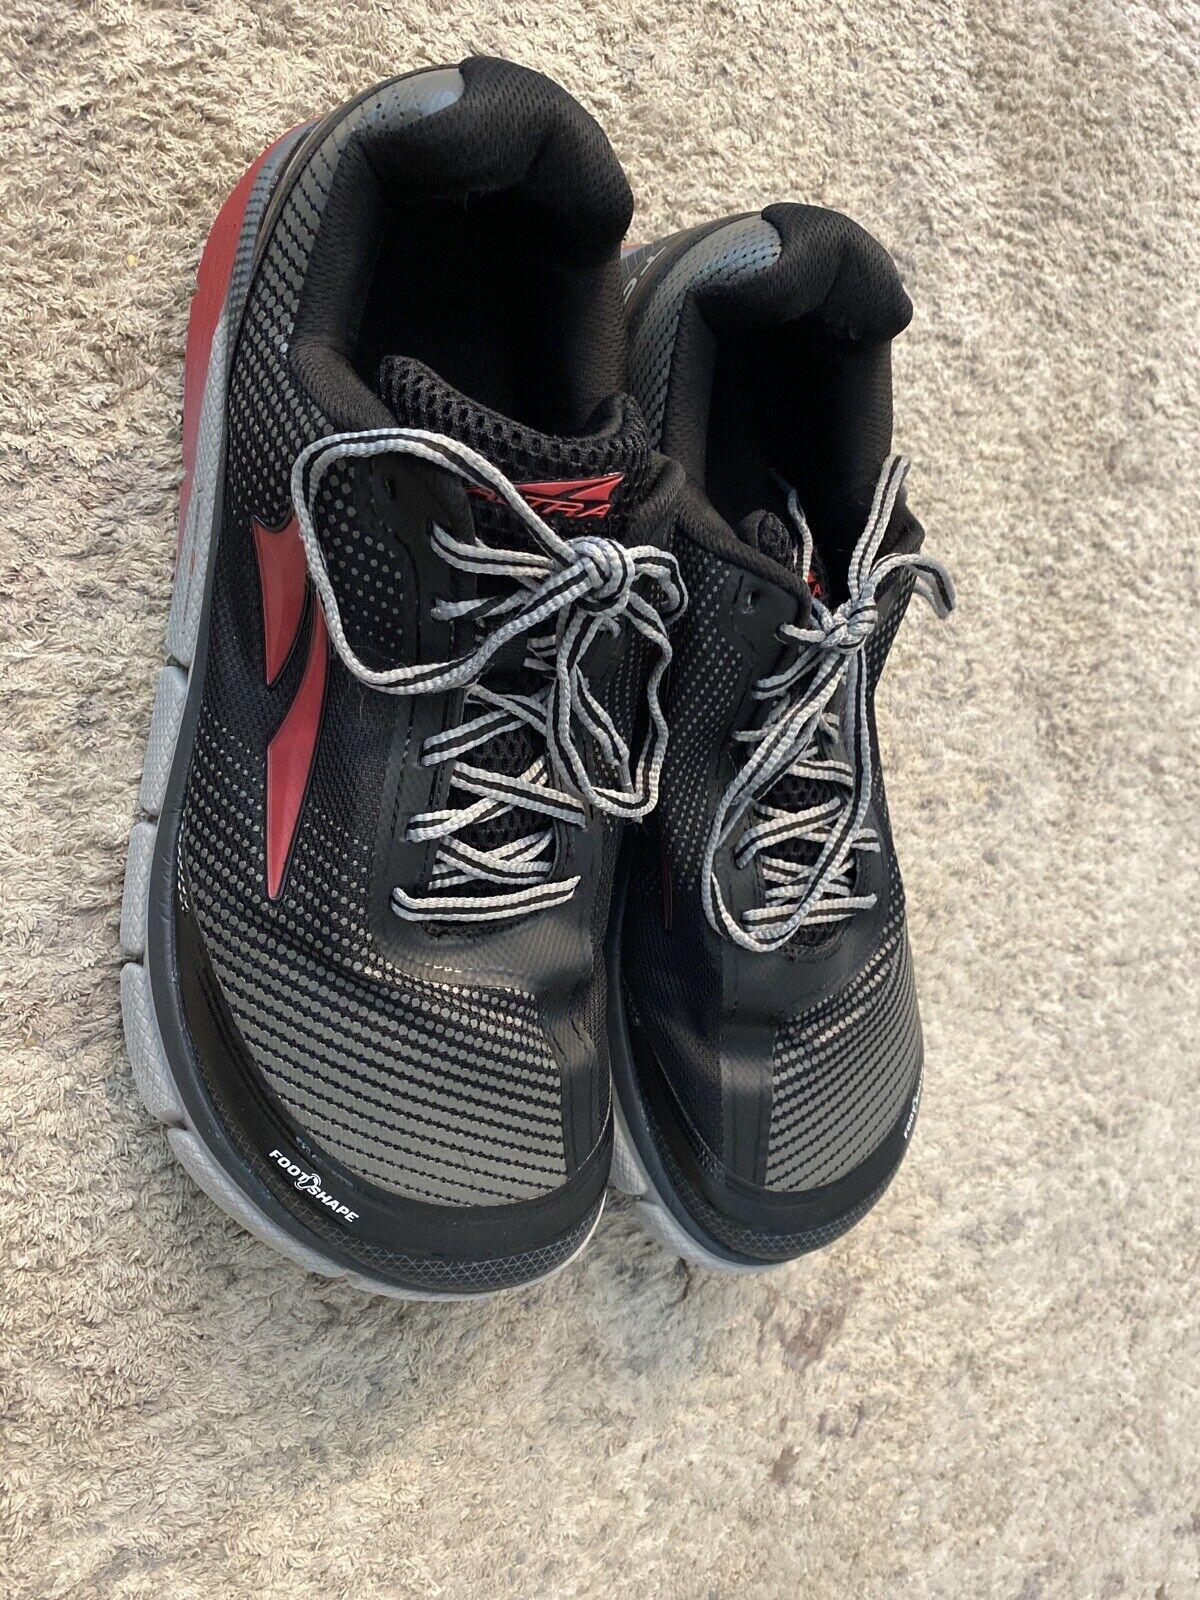 Altra Zero Drop Footwear Instinct 1 5 Men S Running Shoes Size 7 D Medium For Sale Online Ebay